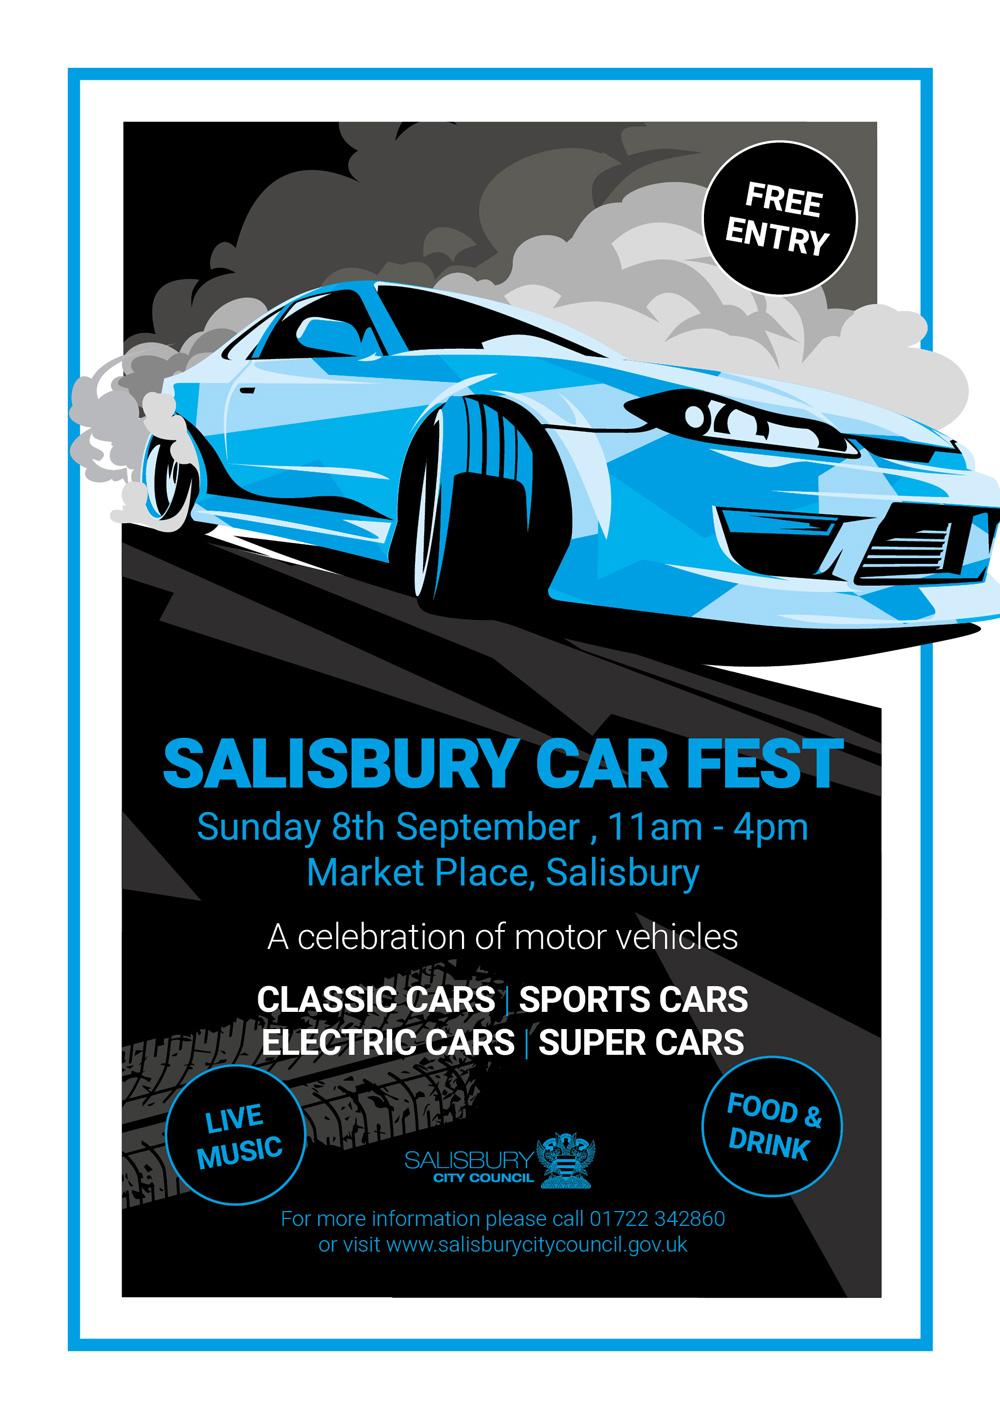 Salisbury Car Fest on 8 September at 11:00